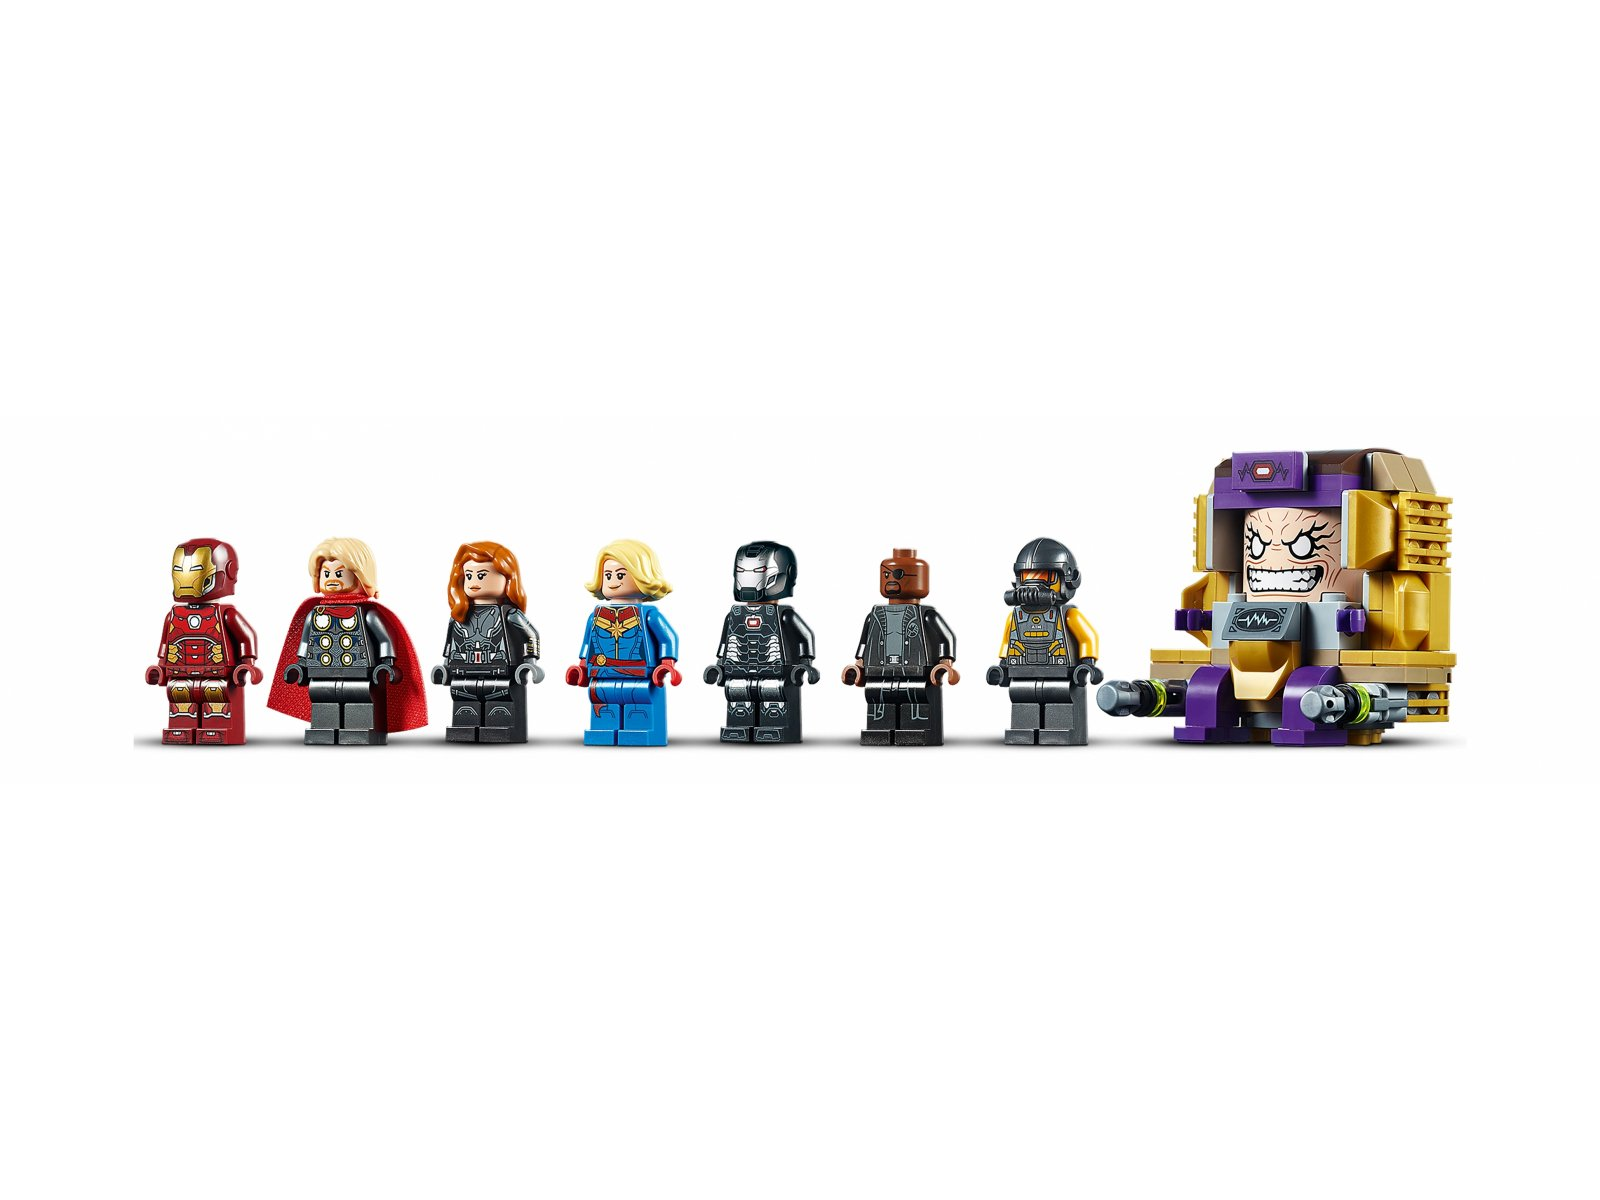 LEGO 76153 Avengers Lotniskowiec